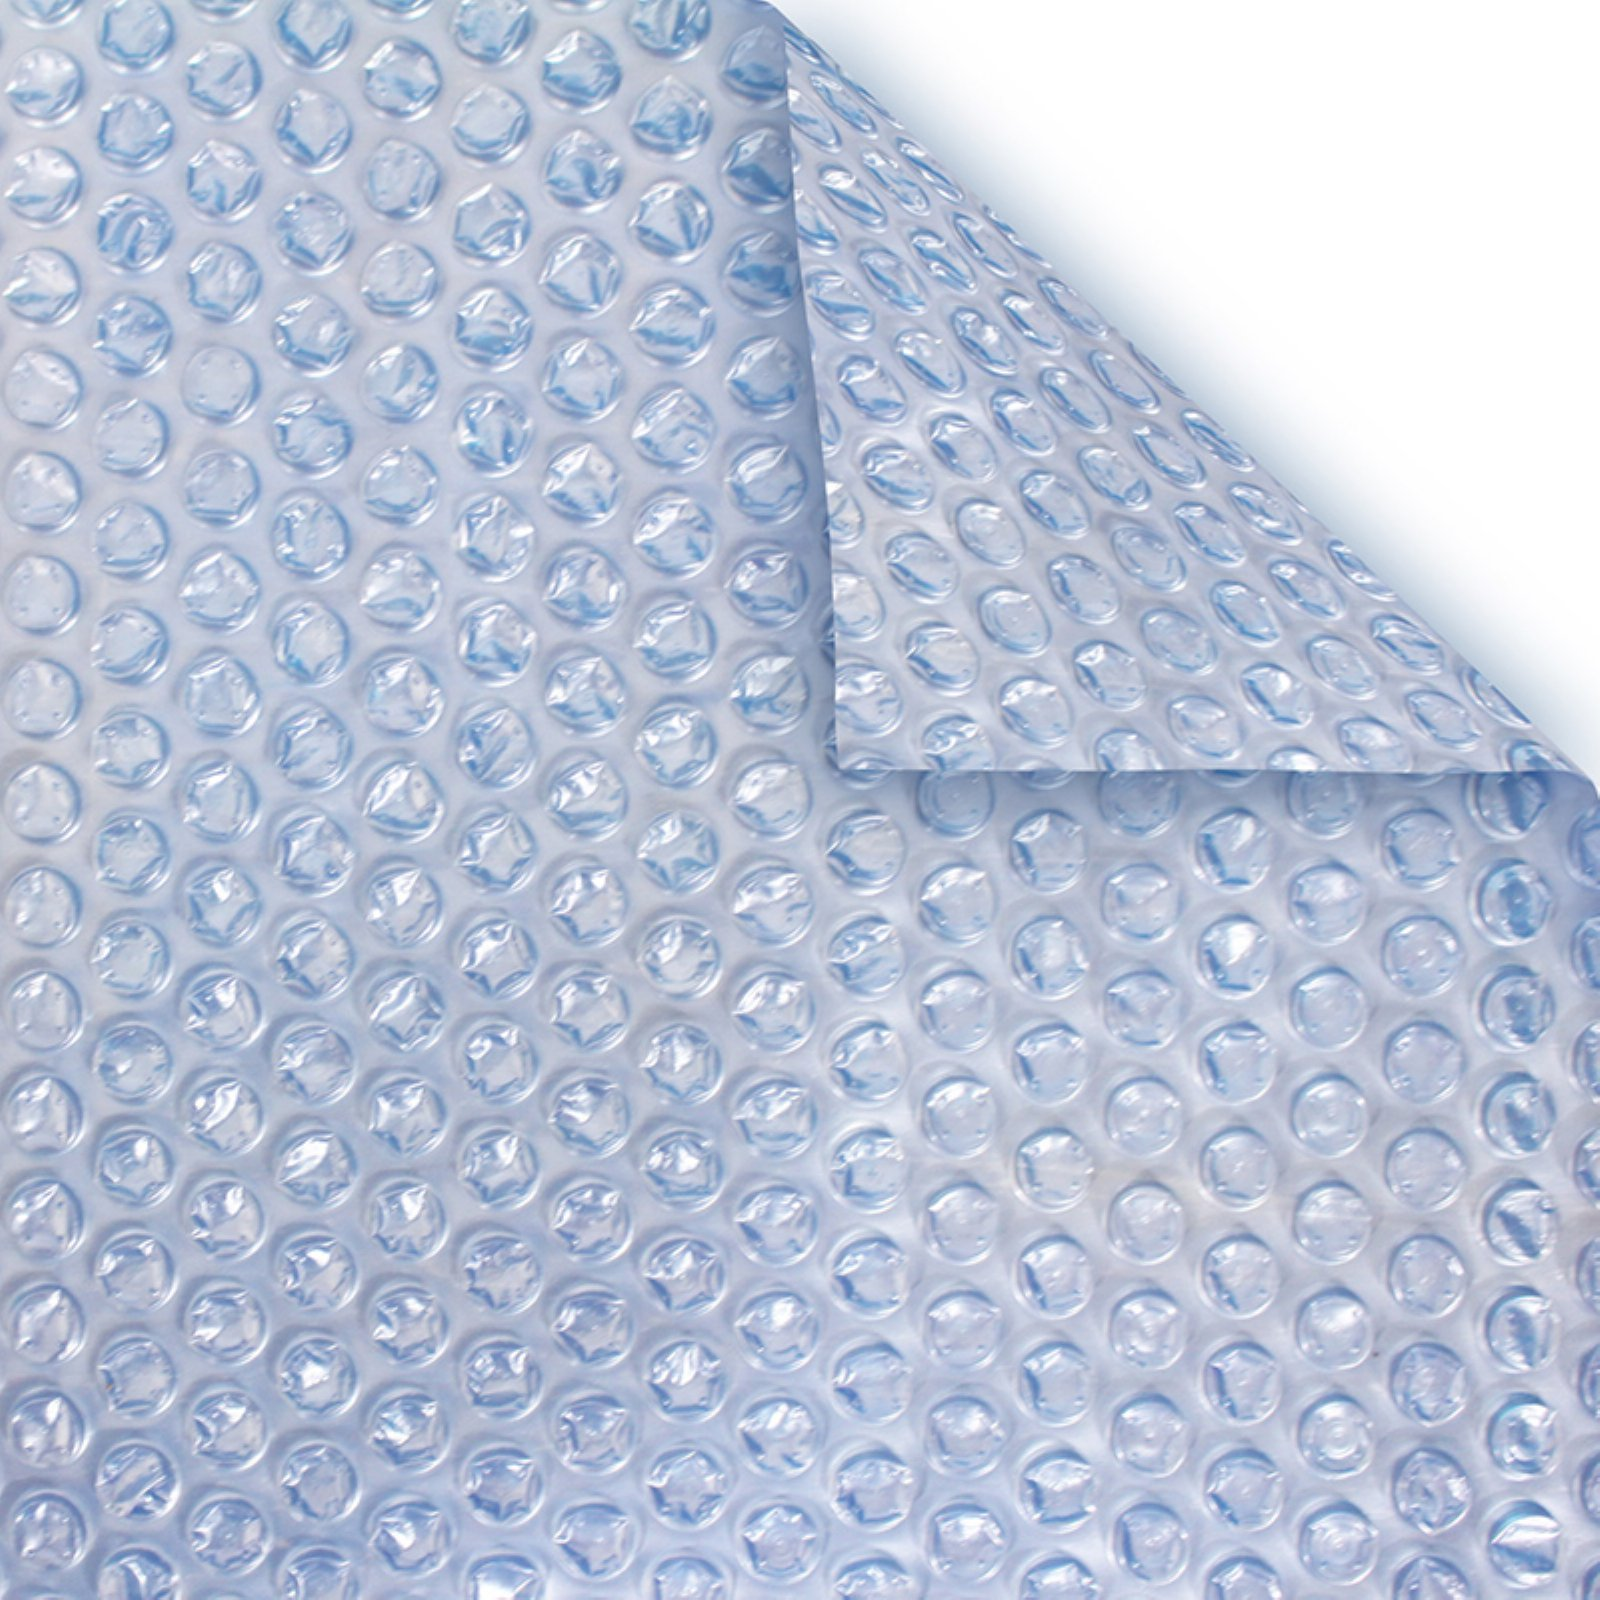 Robelle Clear Solar Pool Cover